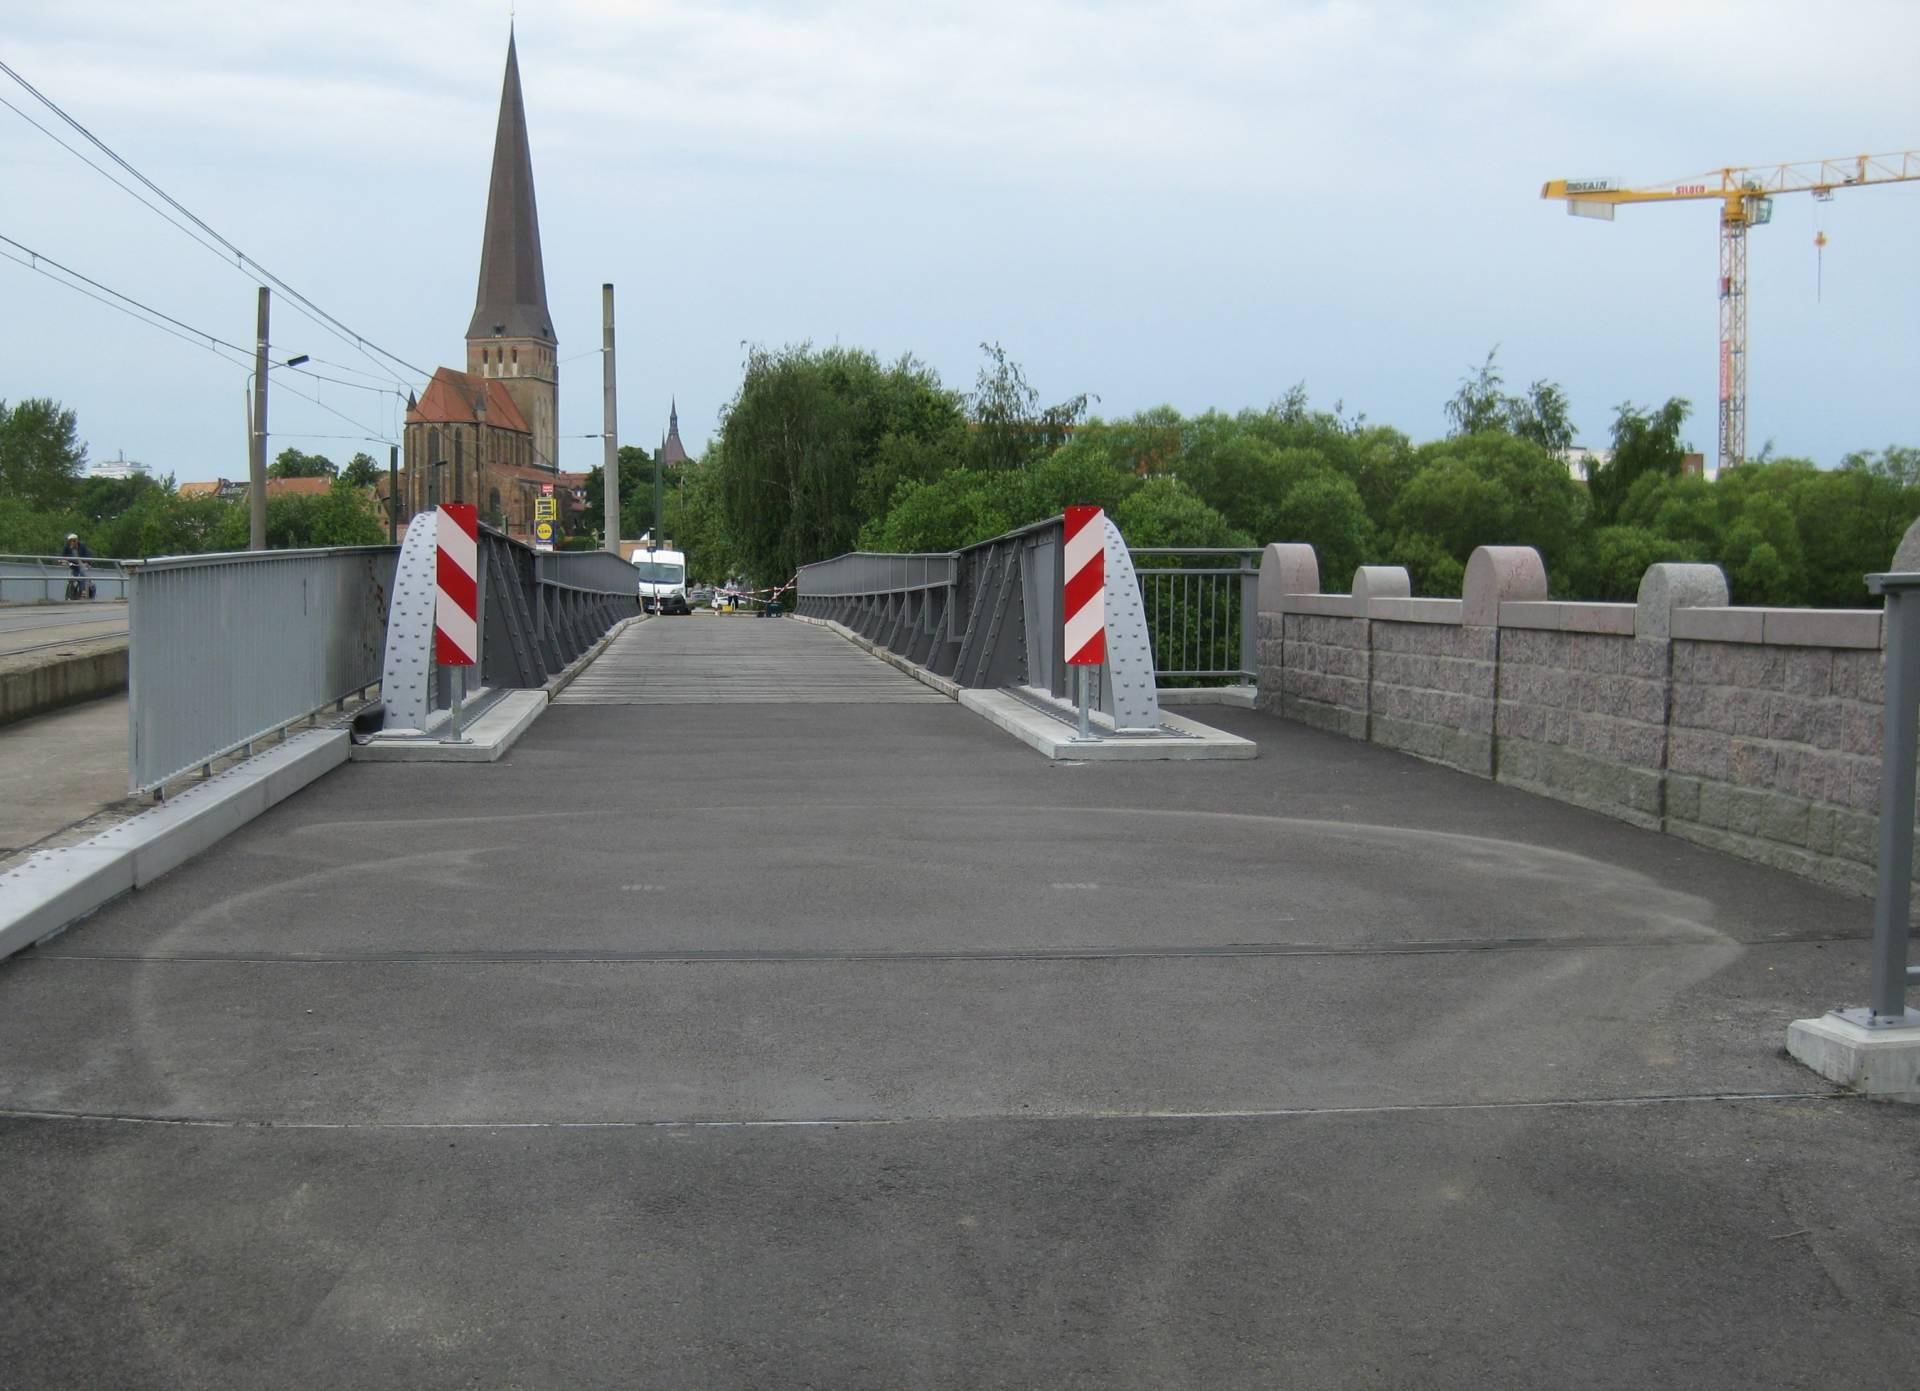 Petribrücke Rostock